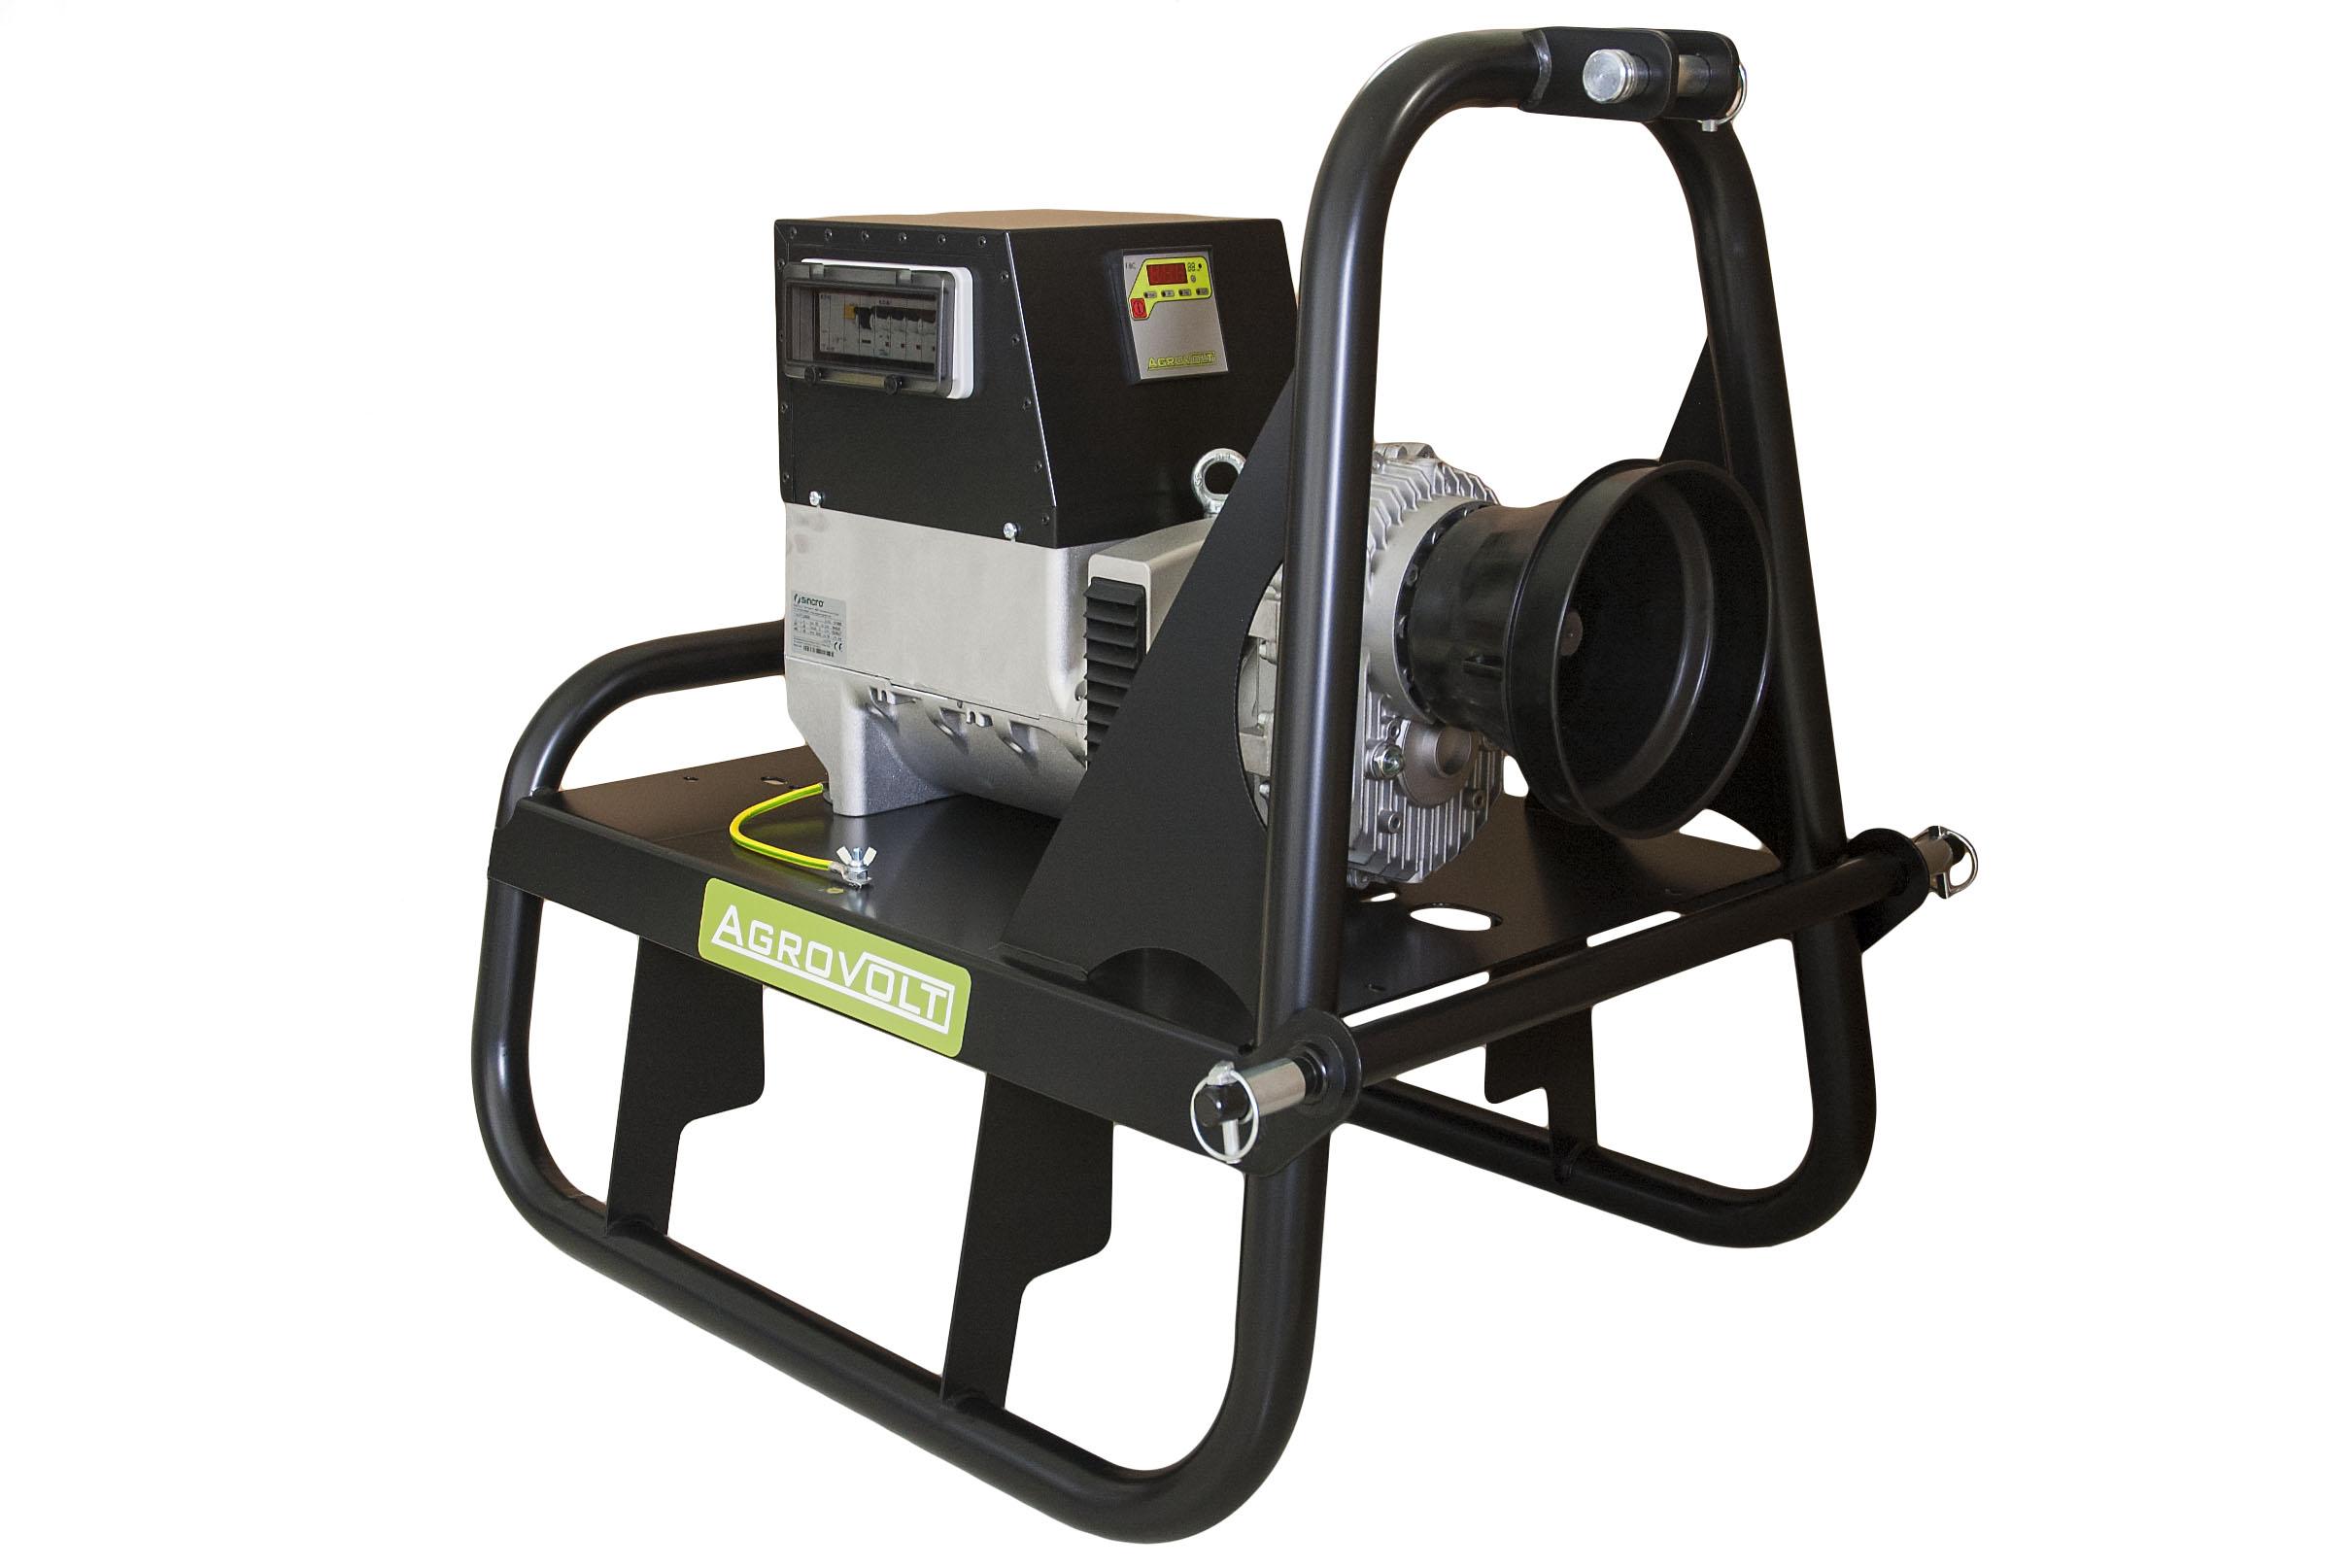 FOGO AGROVOLT Zapfwellengenerator 18 kVA AV18R mit AVR